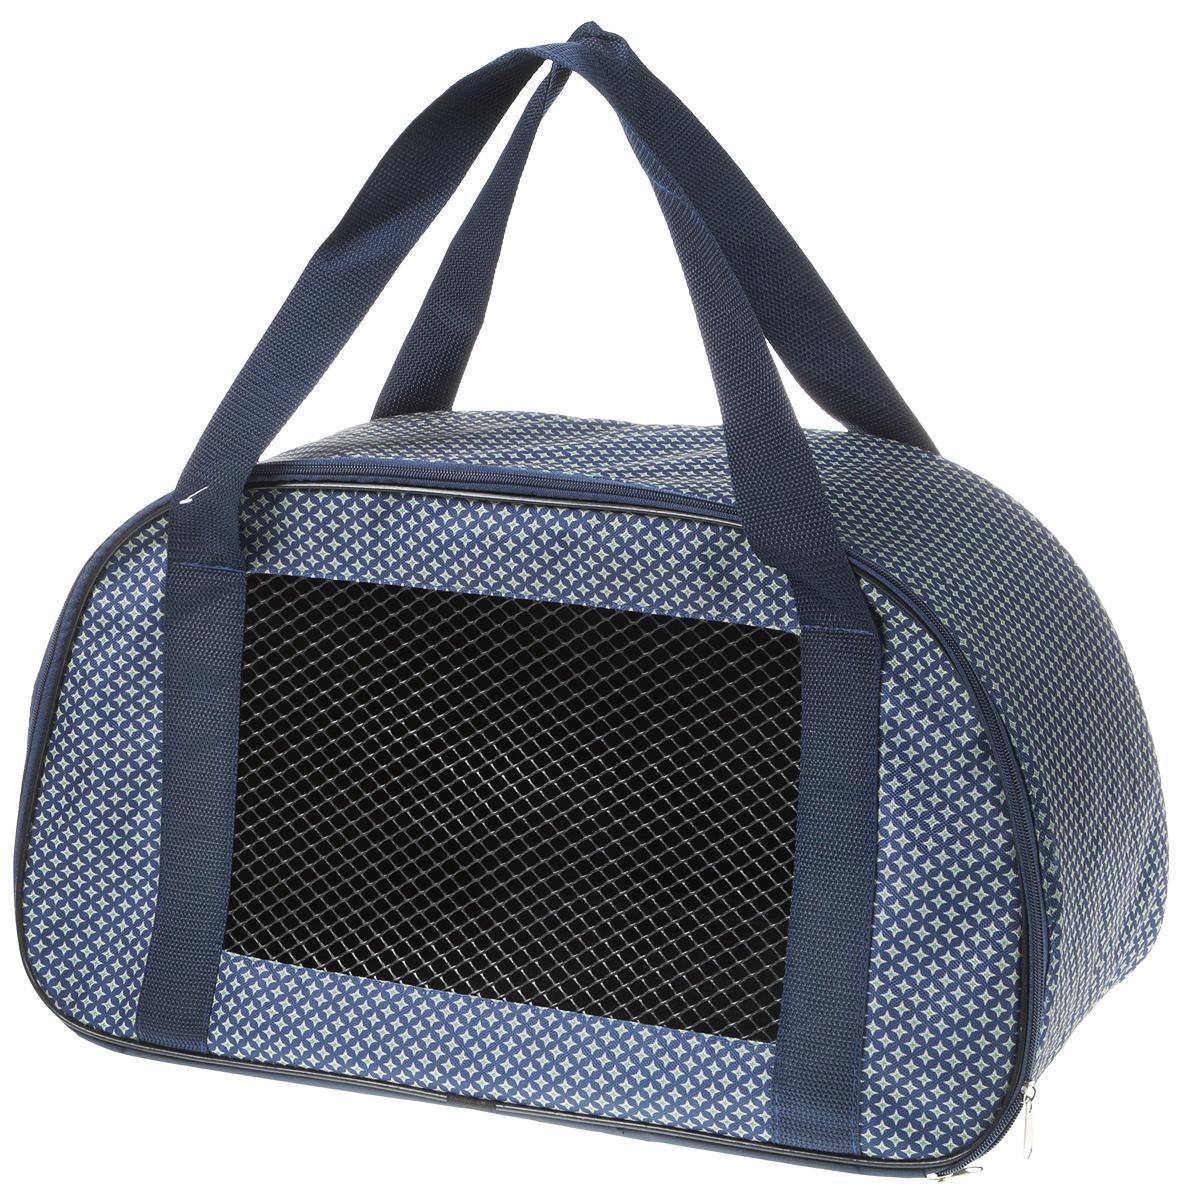 Сумка-переноска для животных Теремок, цвет: светло-синий, 56 х 28 х 30 см сумка переноска для животных теремок цвет голубой синий белый 44 х 19 х 20 см